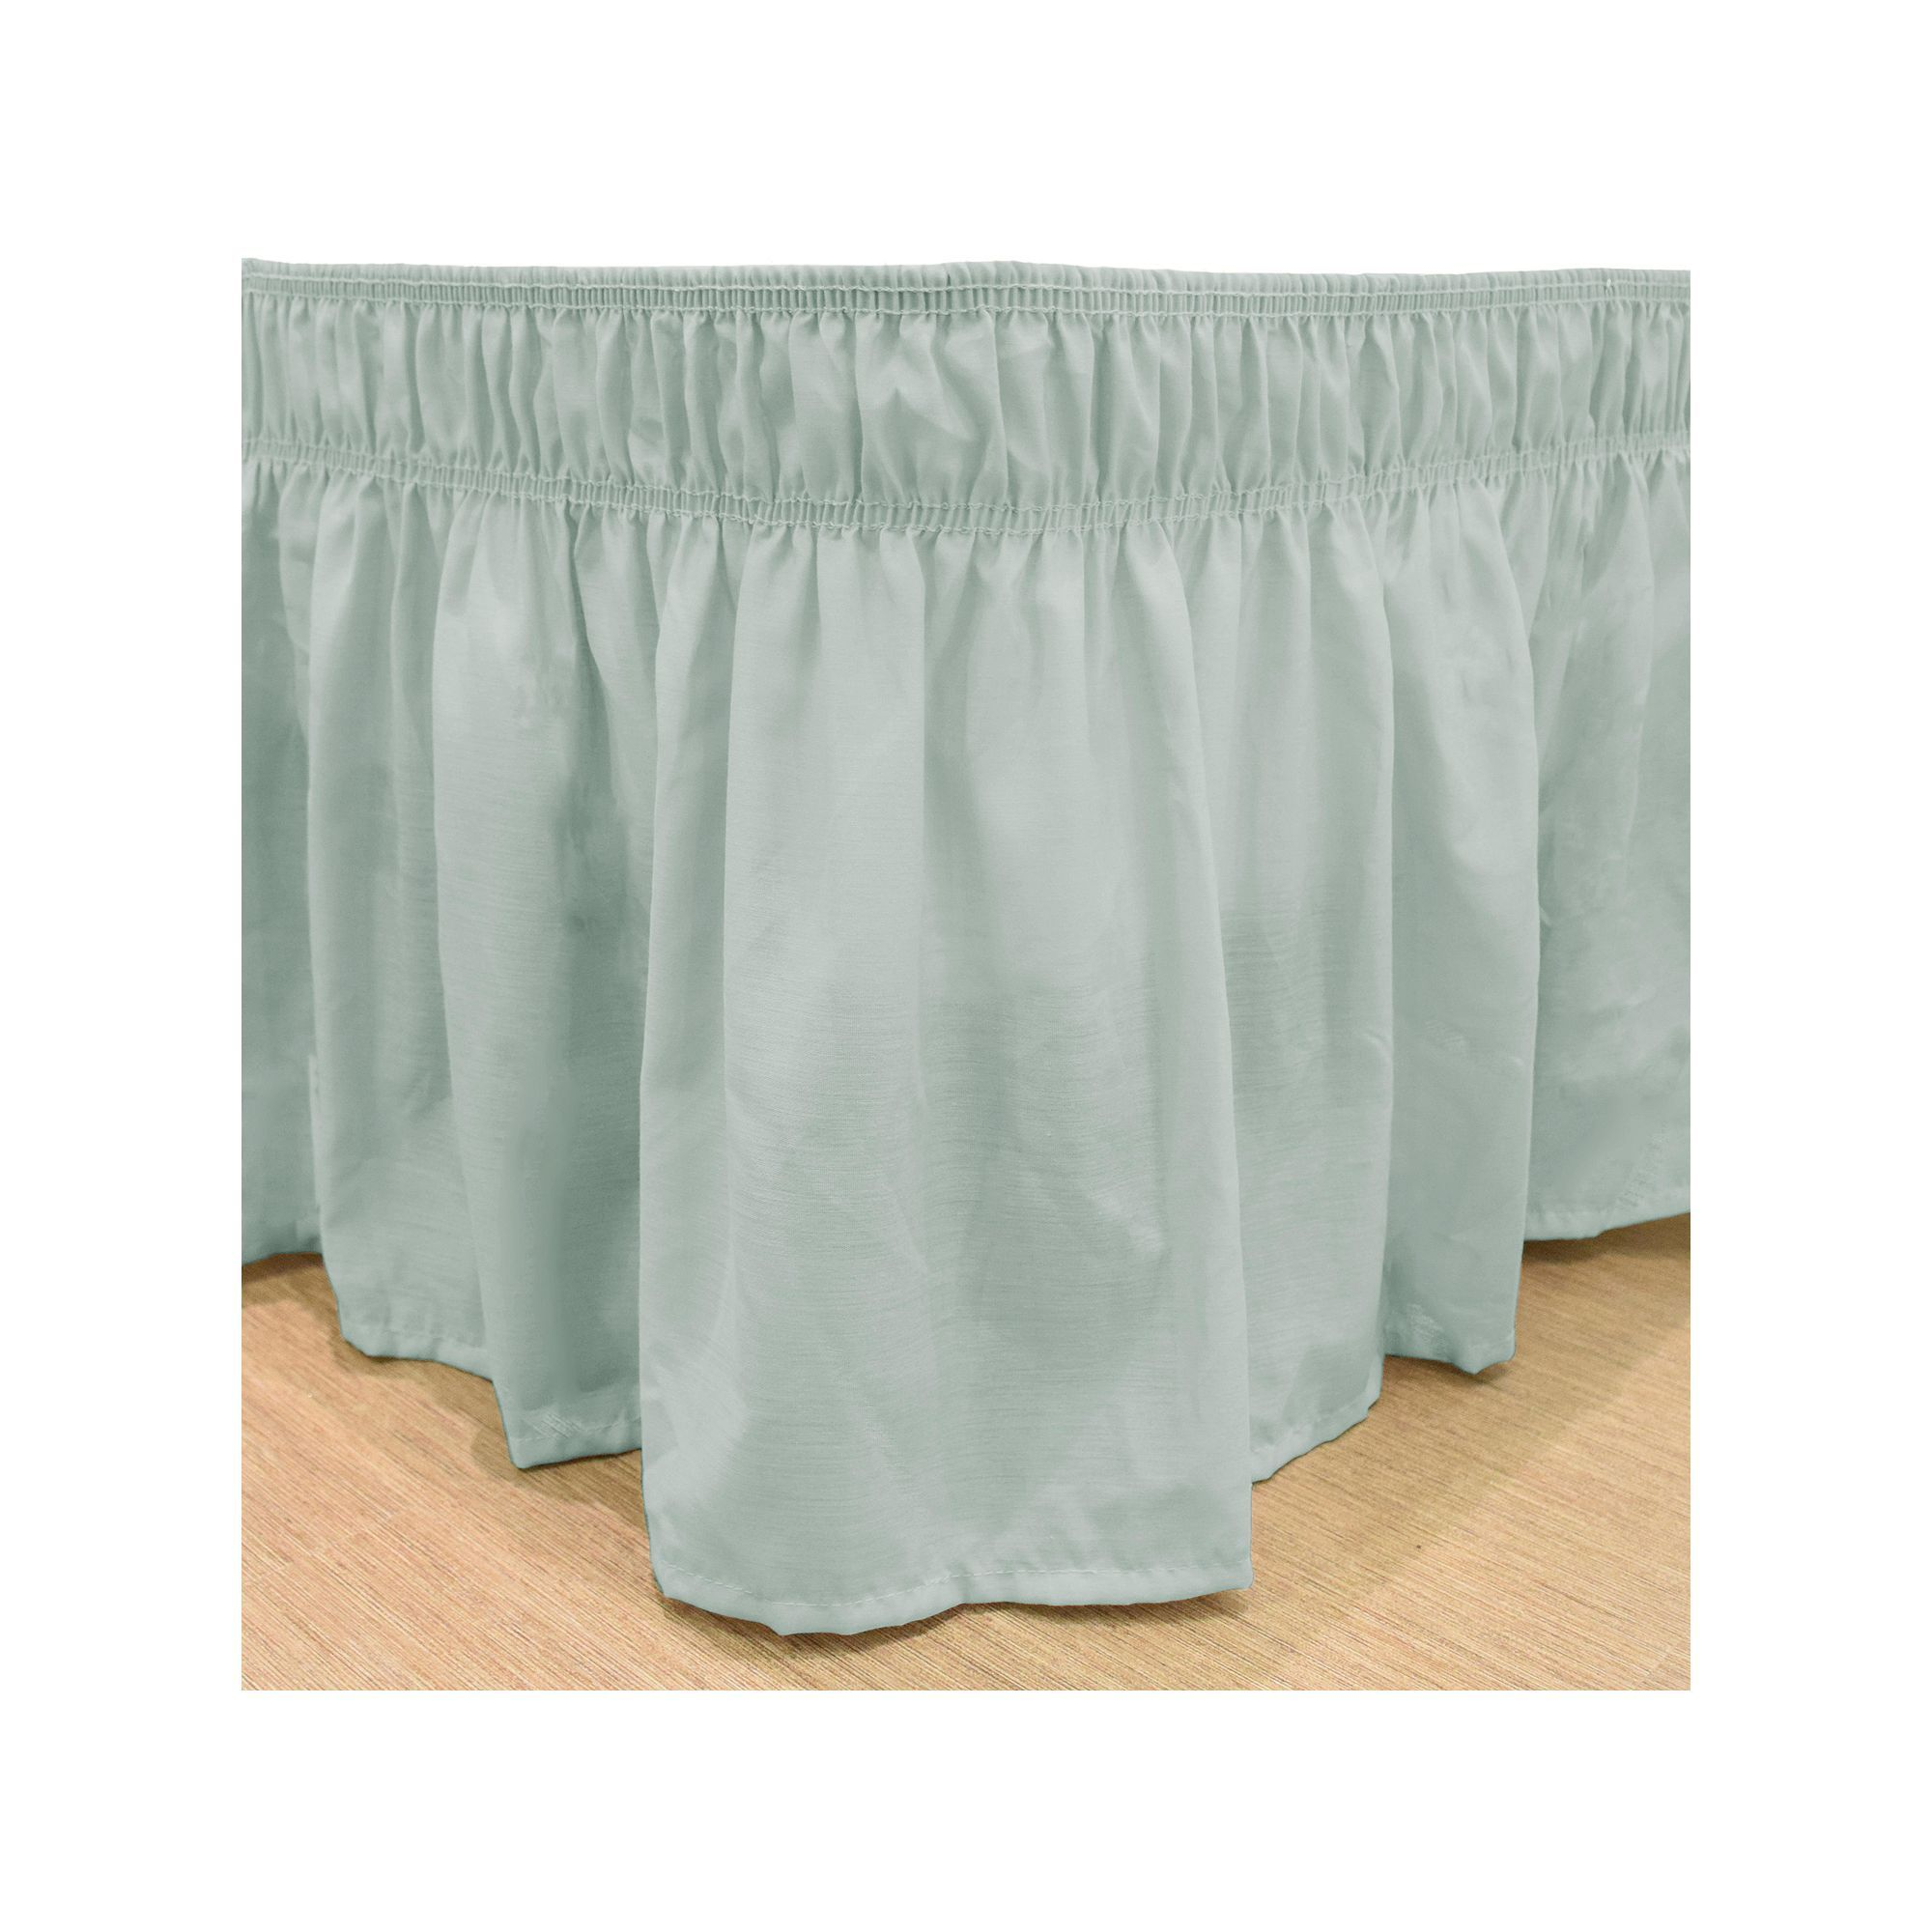 easyfit wrap around solid ruffled bed skirt beig green beig khaki